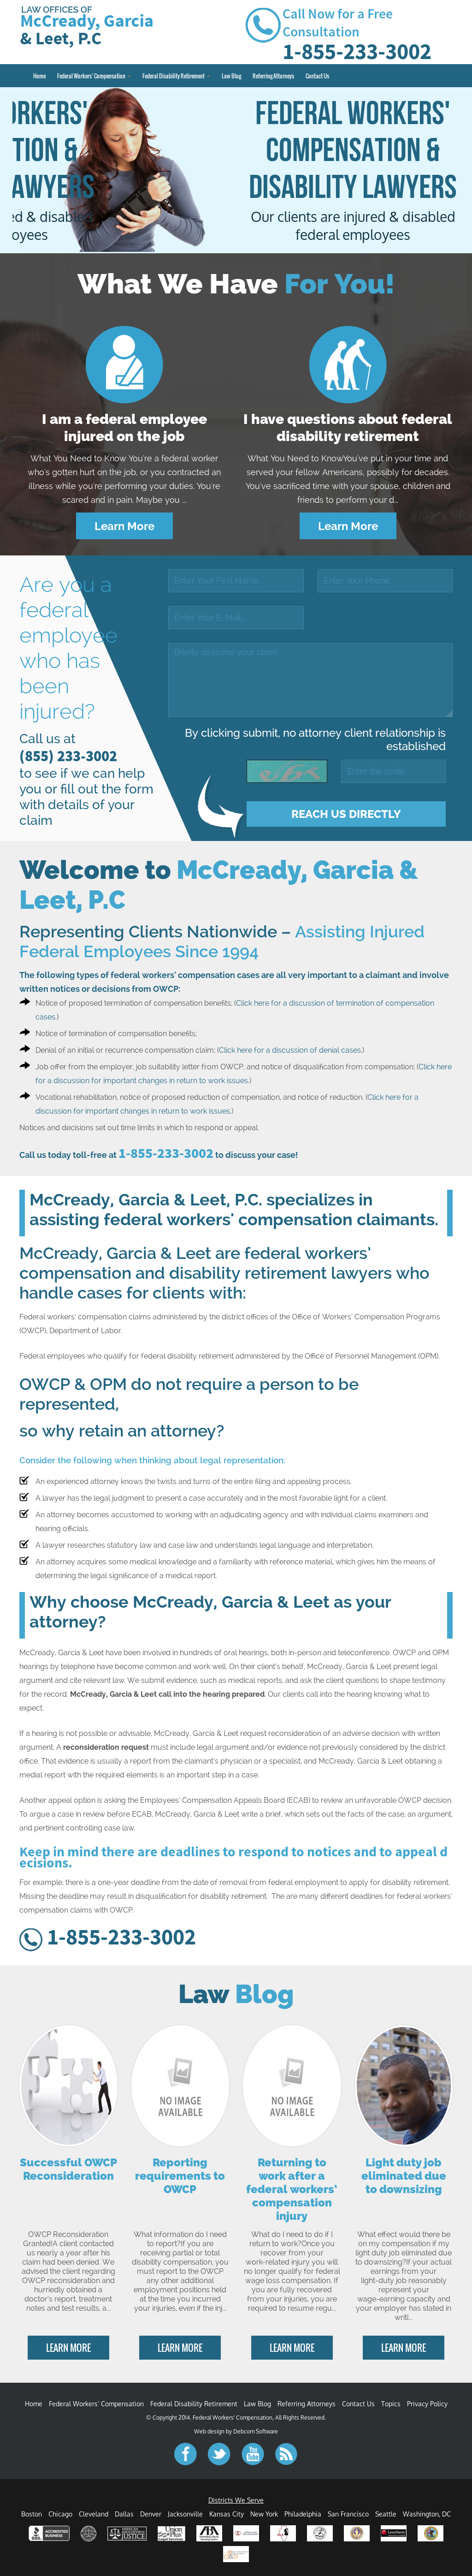 Mccready, Garcia & Leet, P c  Federal Compensation Lawyers